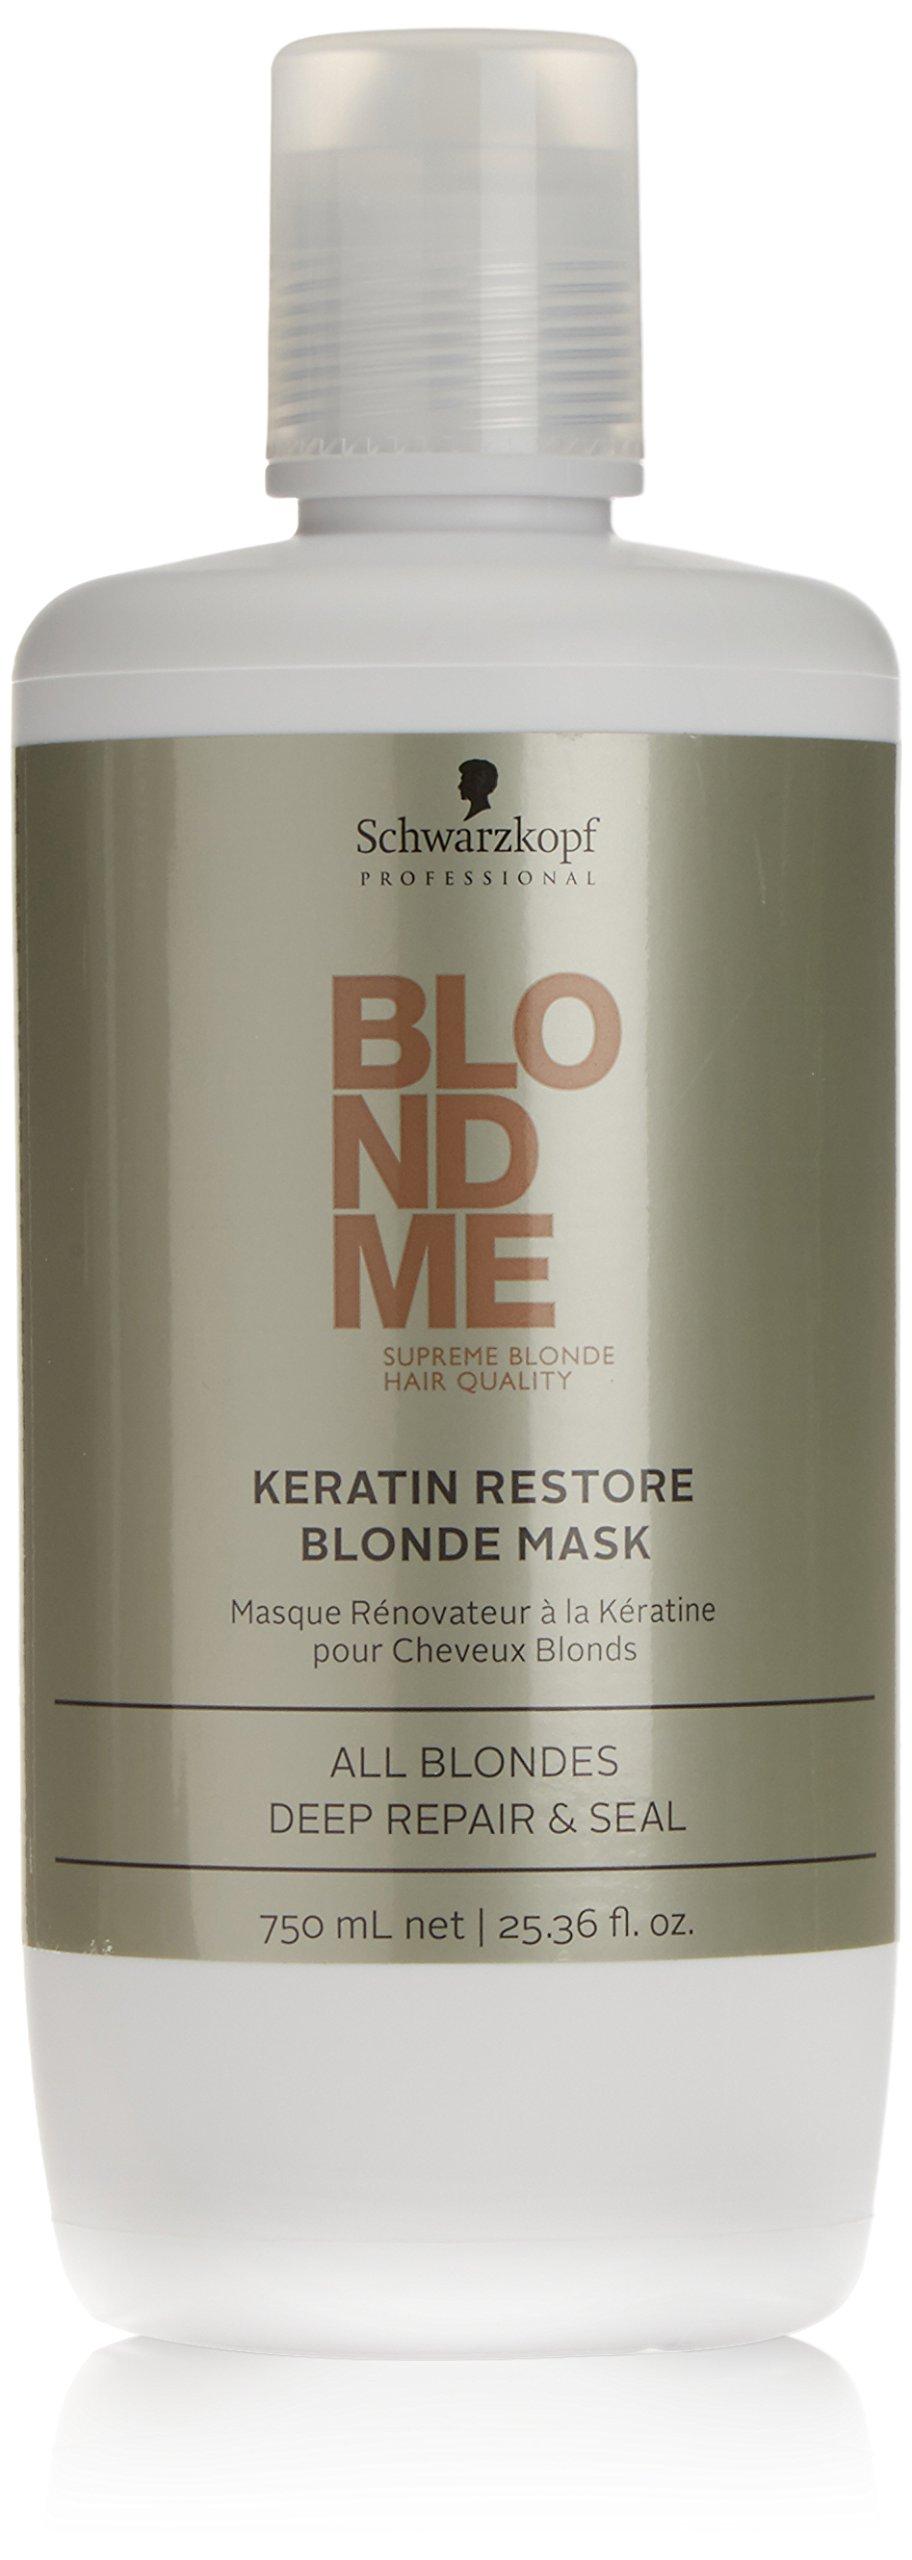 Schwarzkopf Professional Blondme, Keratin Restore Blonde Mask Treatment, 25.3 Ounce